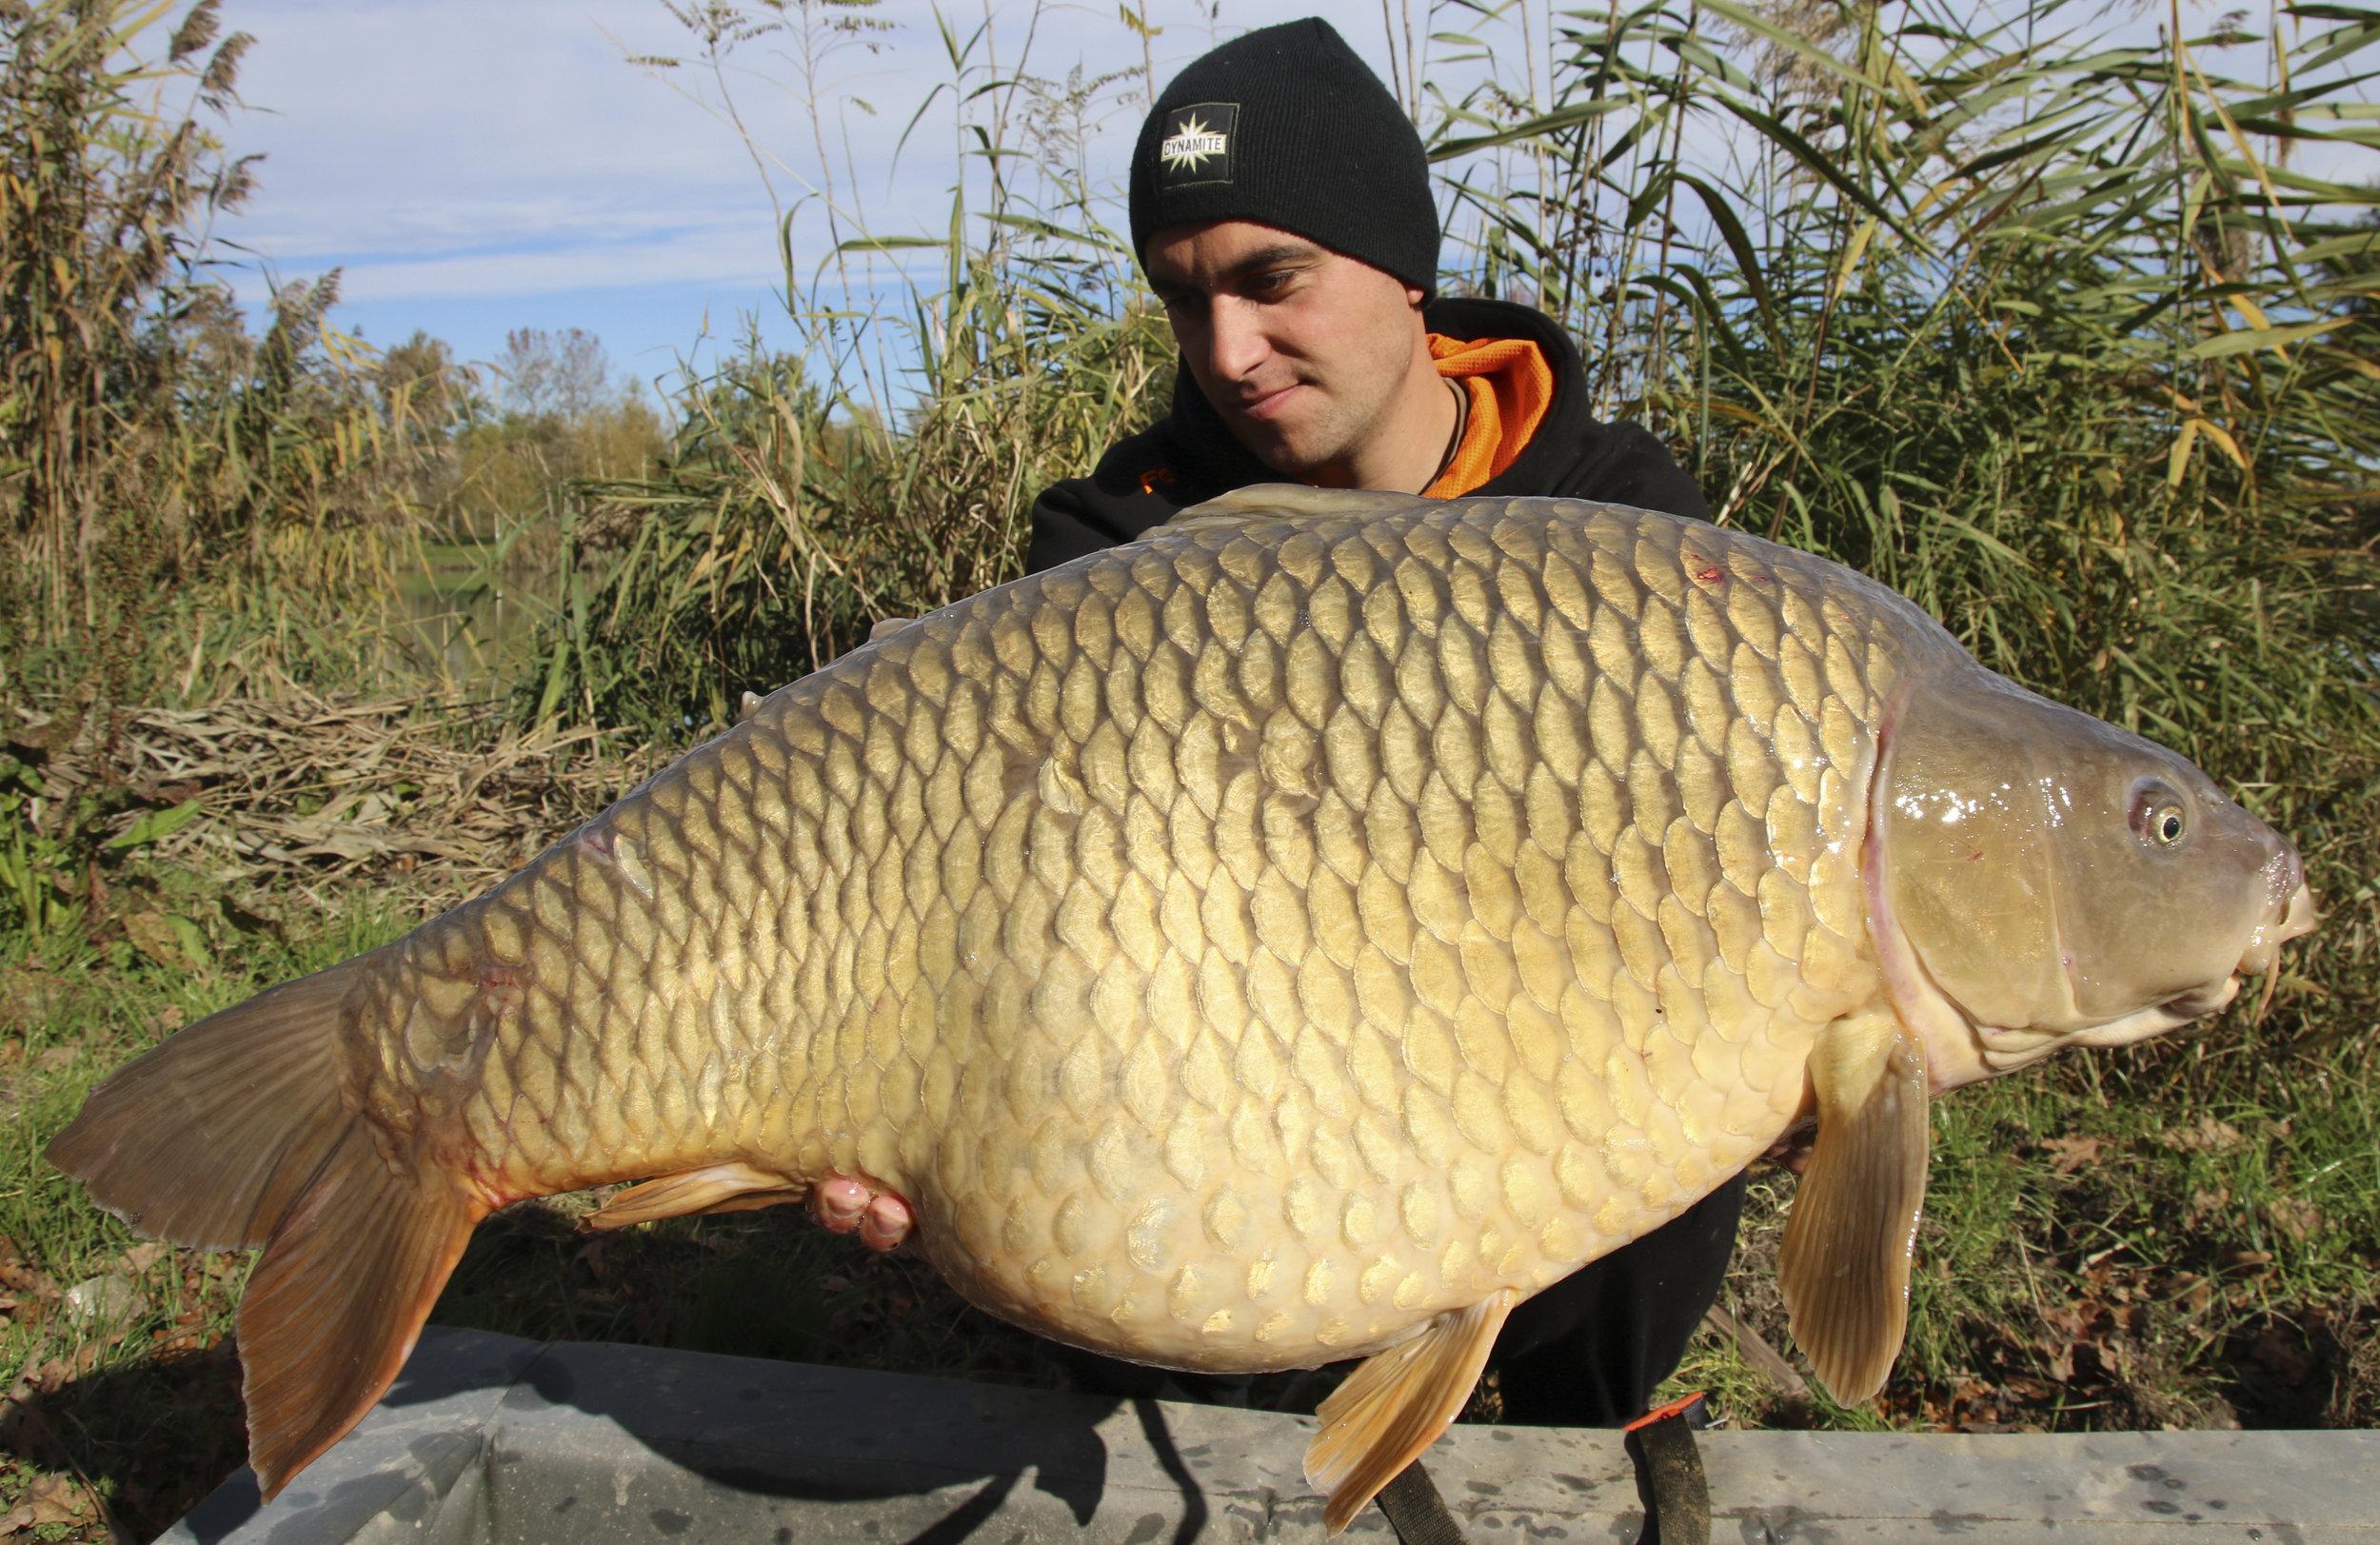 My first bigger carp – 22.6kg.